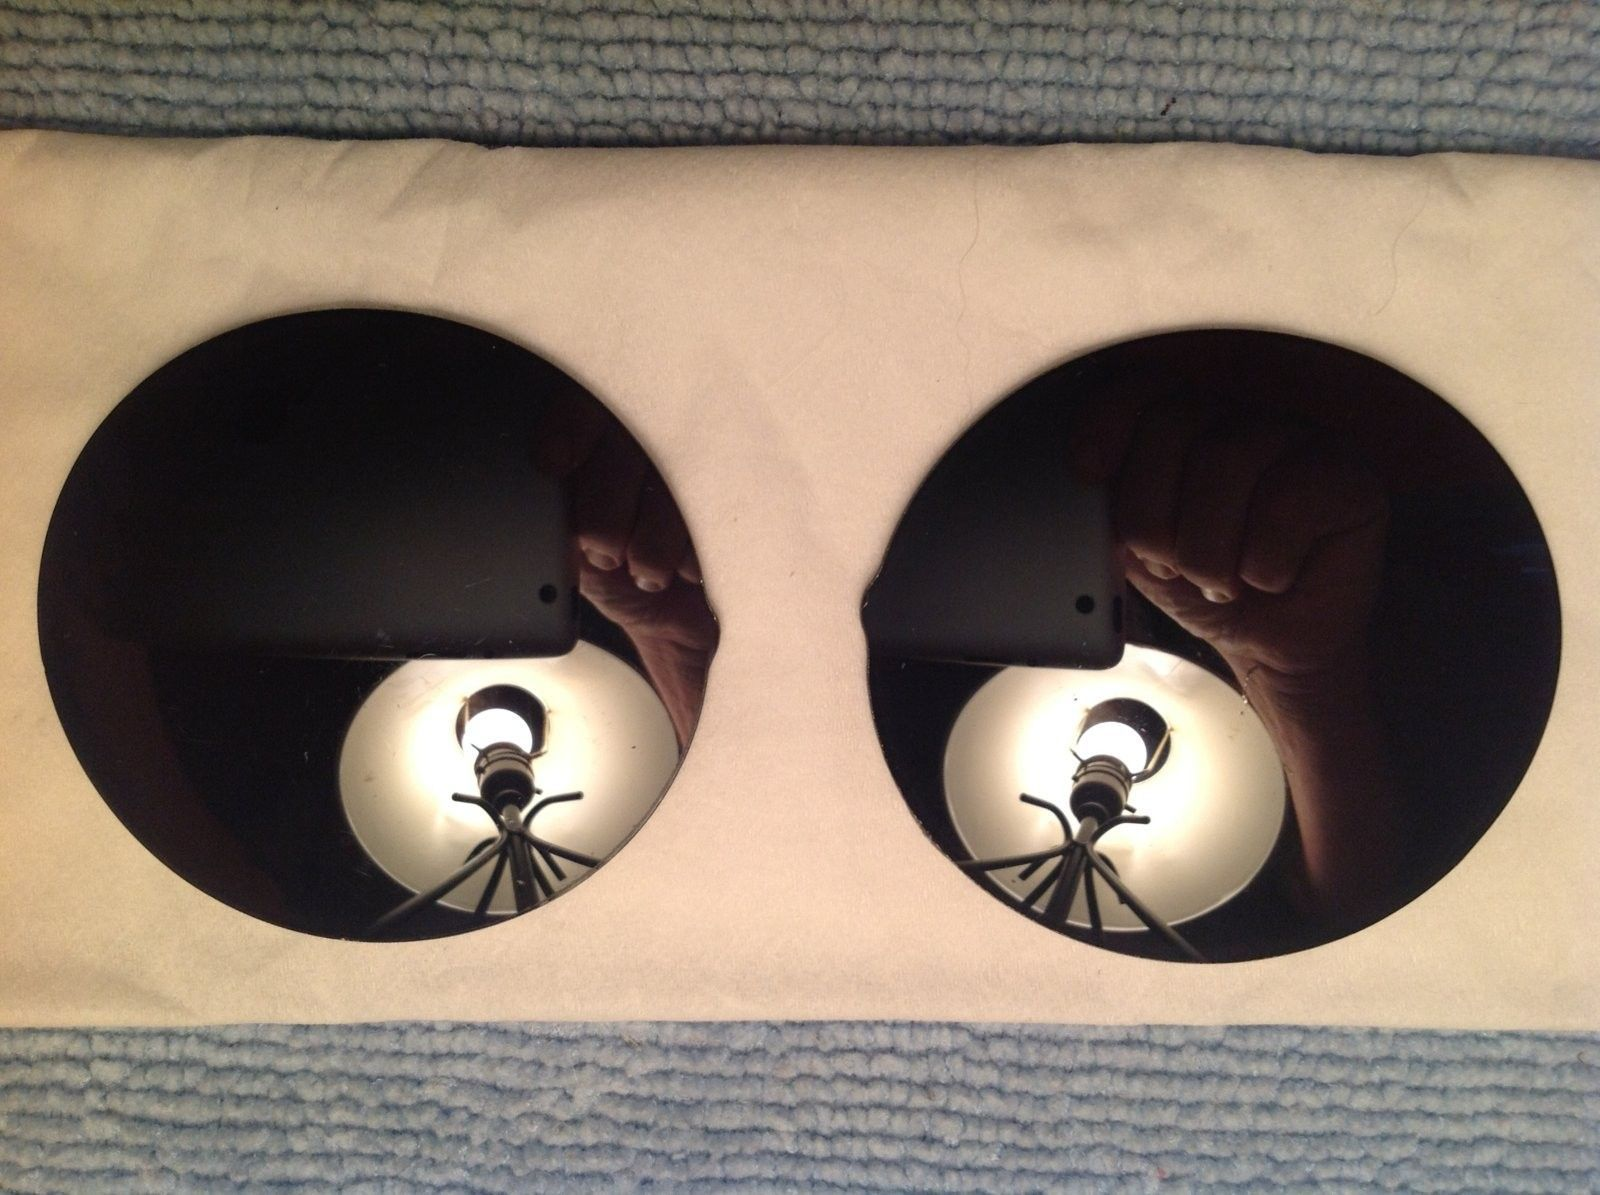 Oakley Moon Lenses- Minor Tiny Scratchesnyway, - image.jpeg